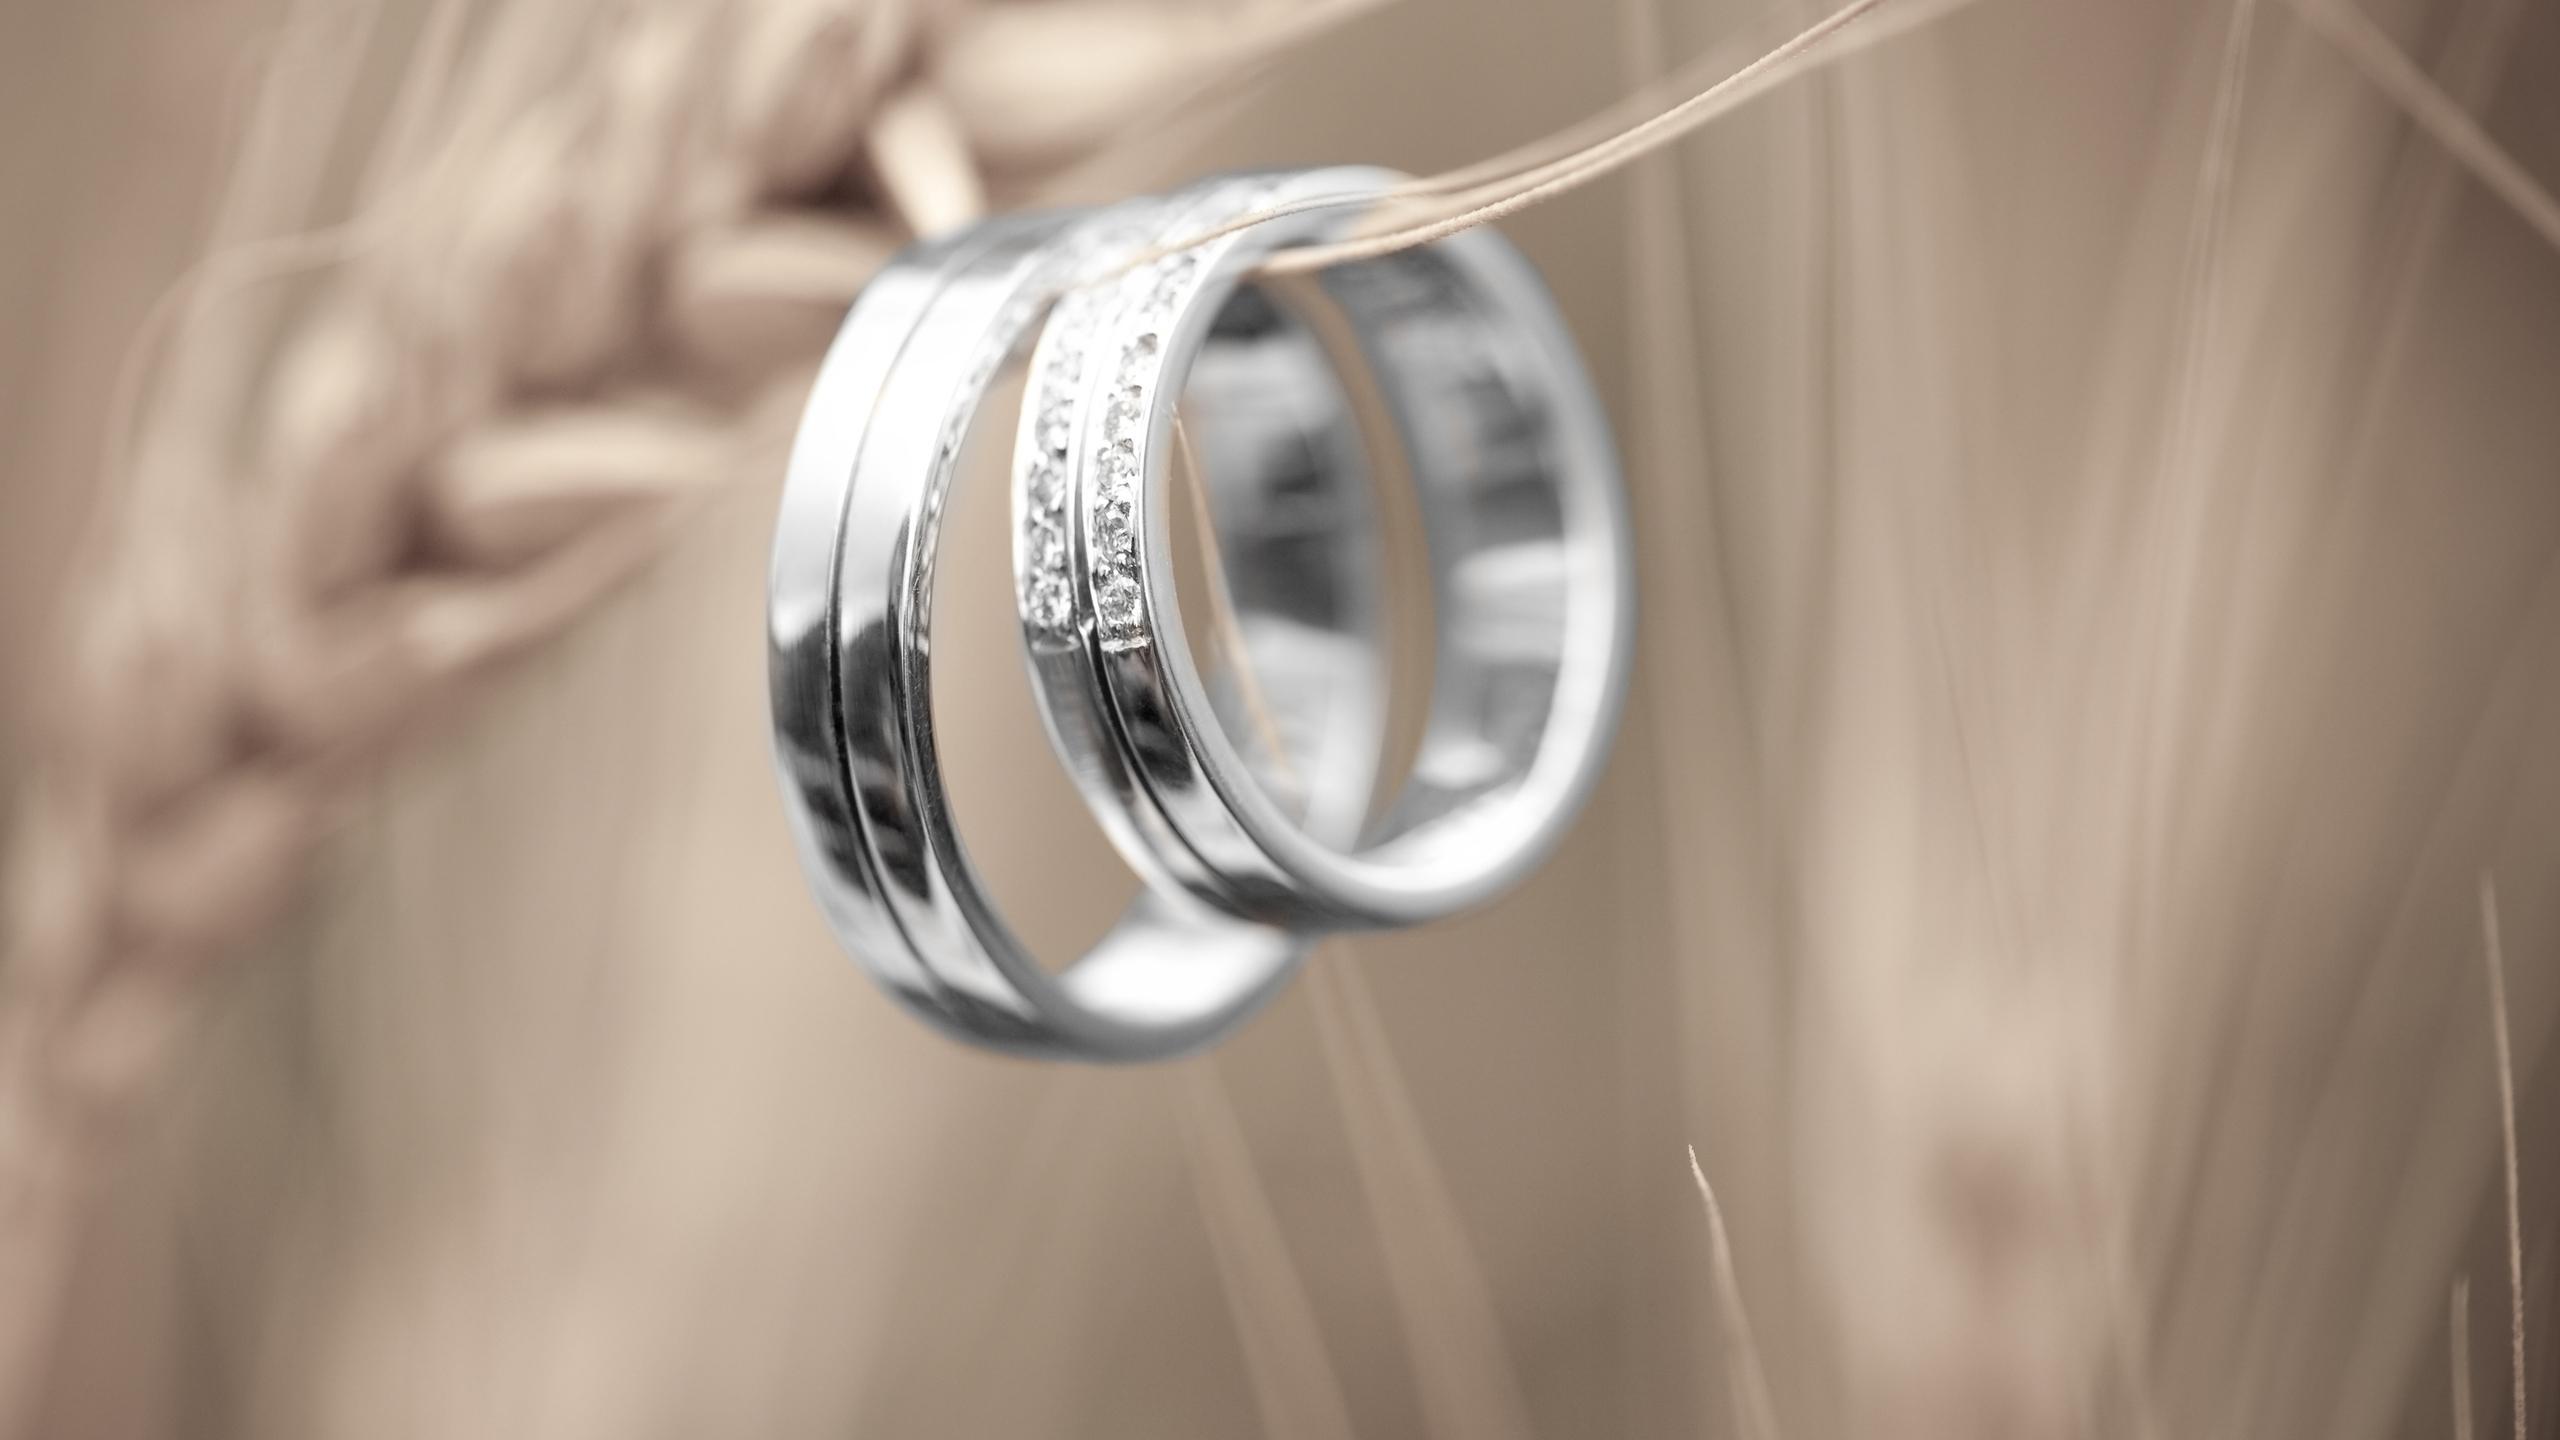 ring wallpaper hd 45342